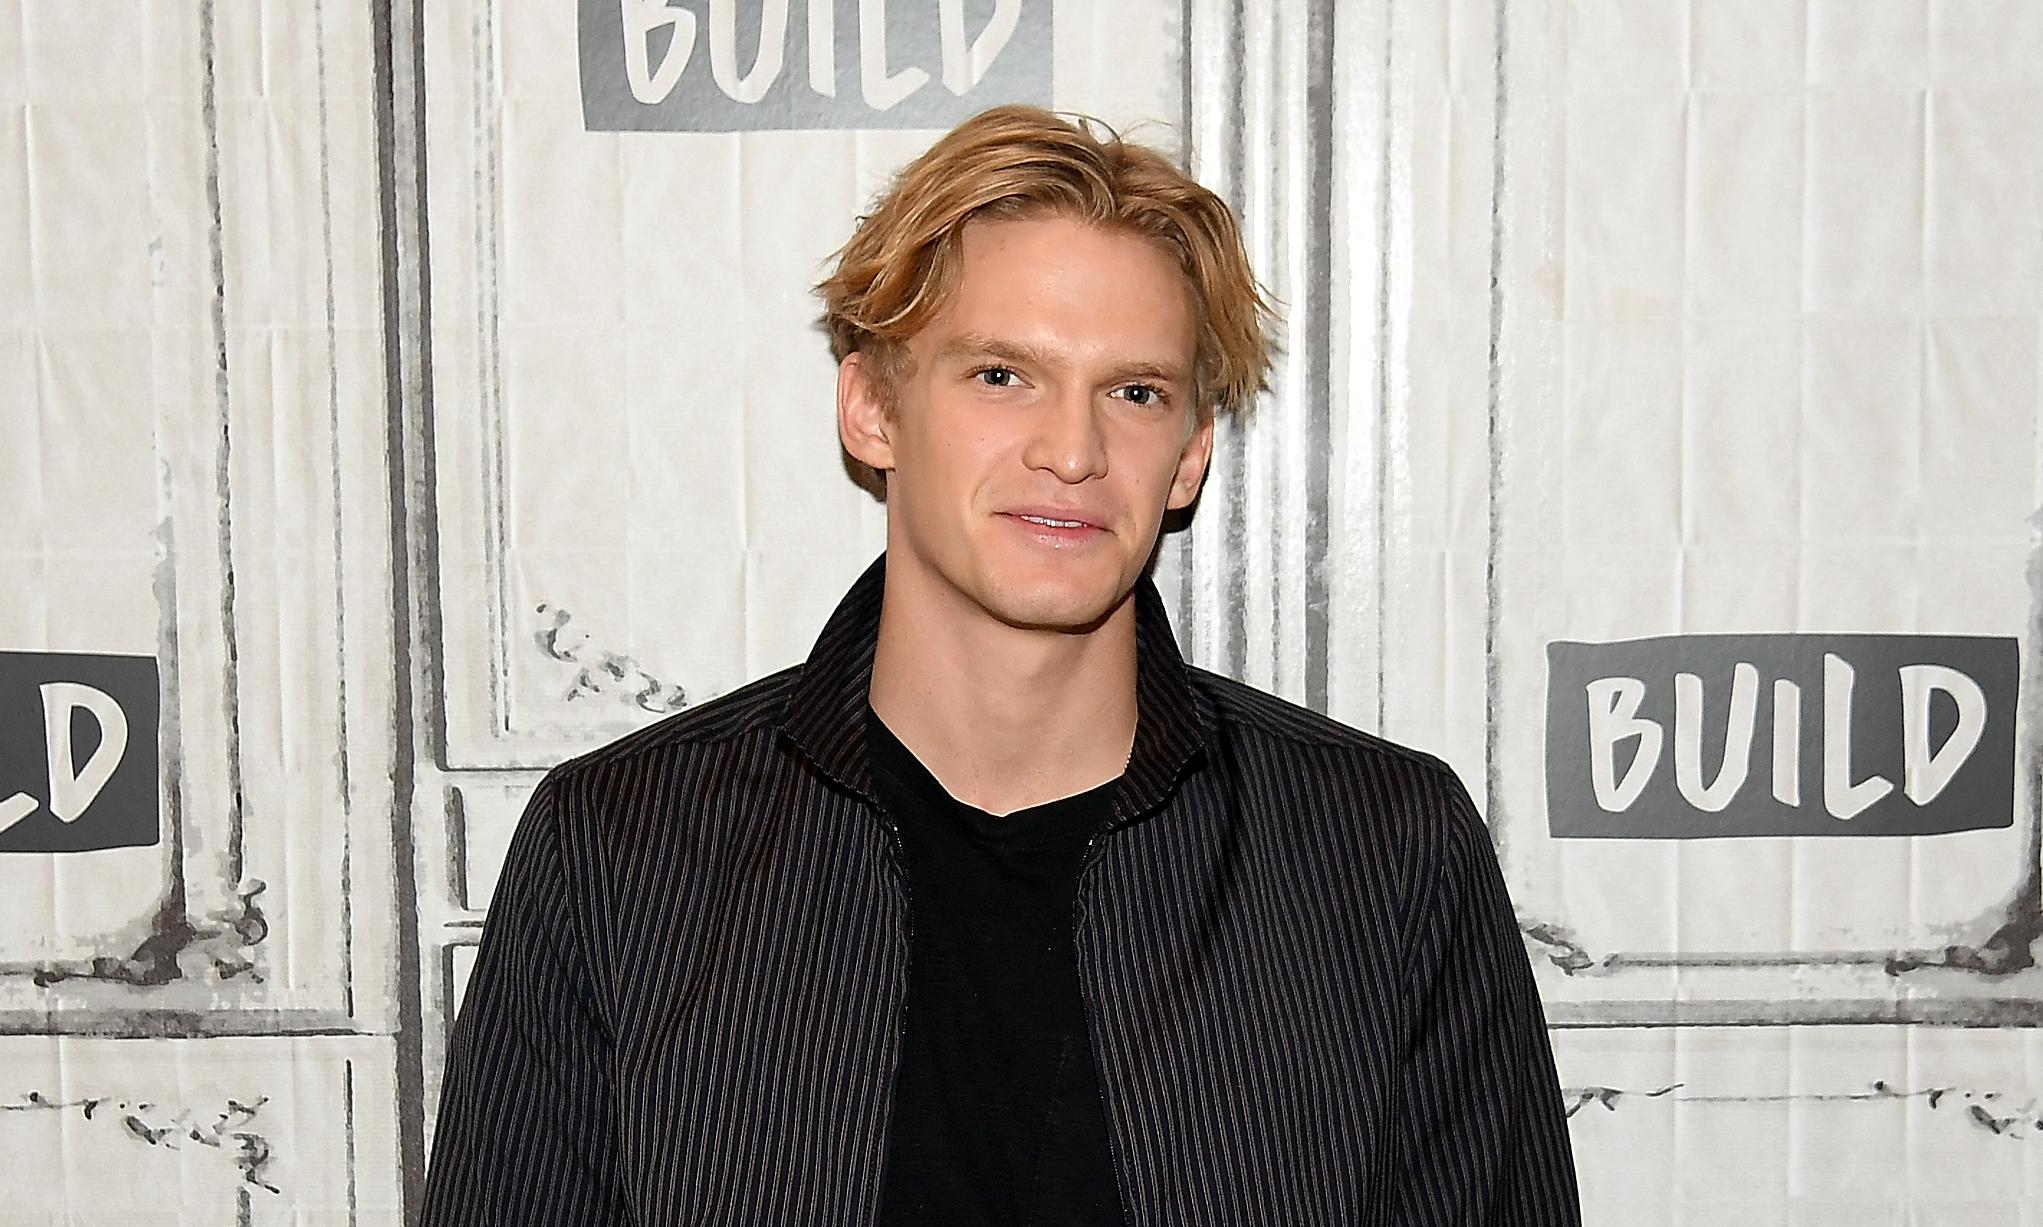 Cody Simpson on my mind